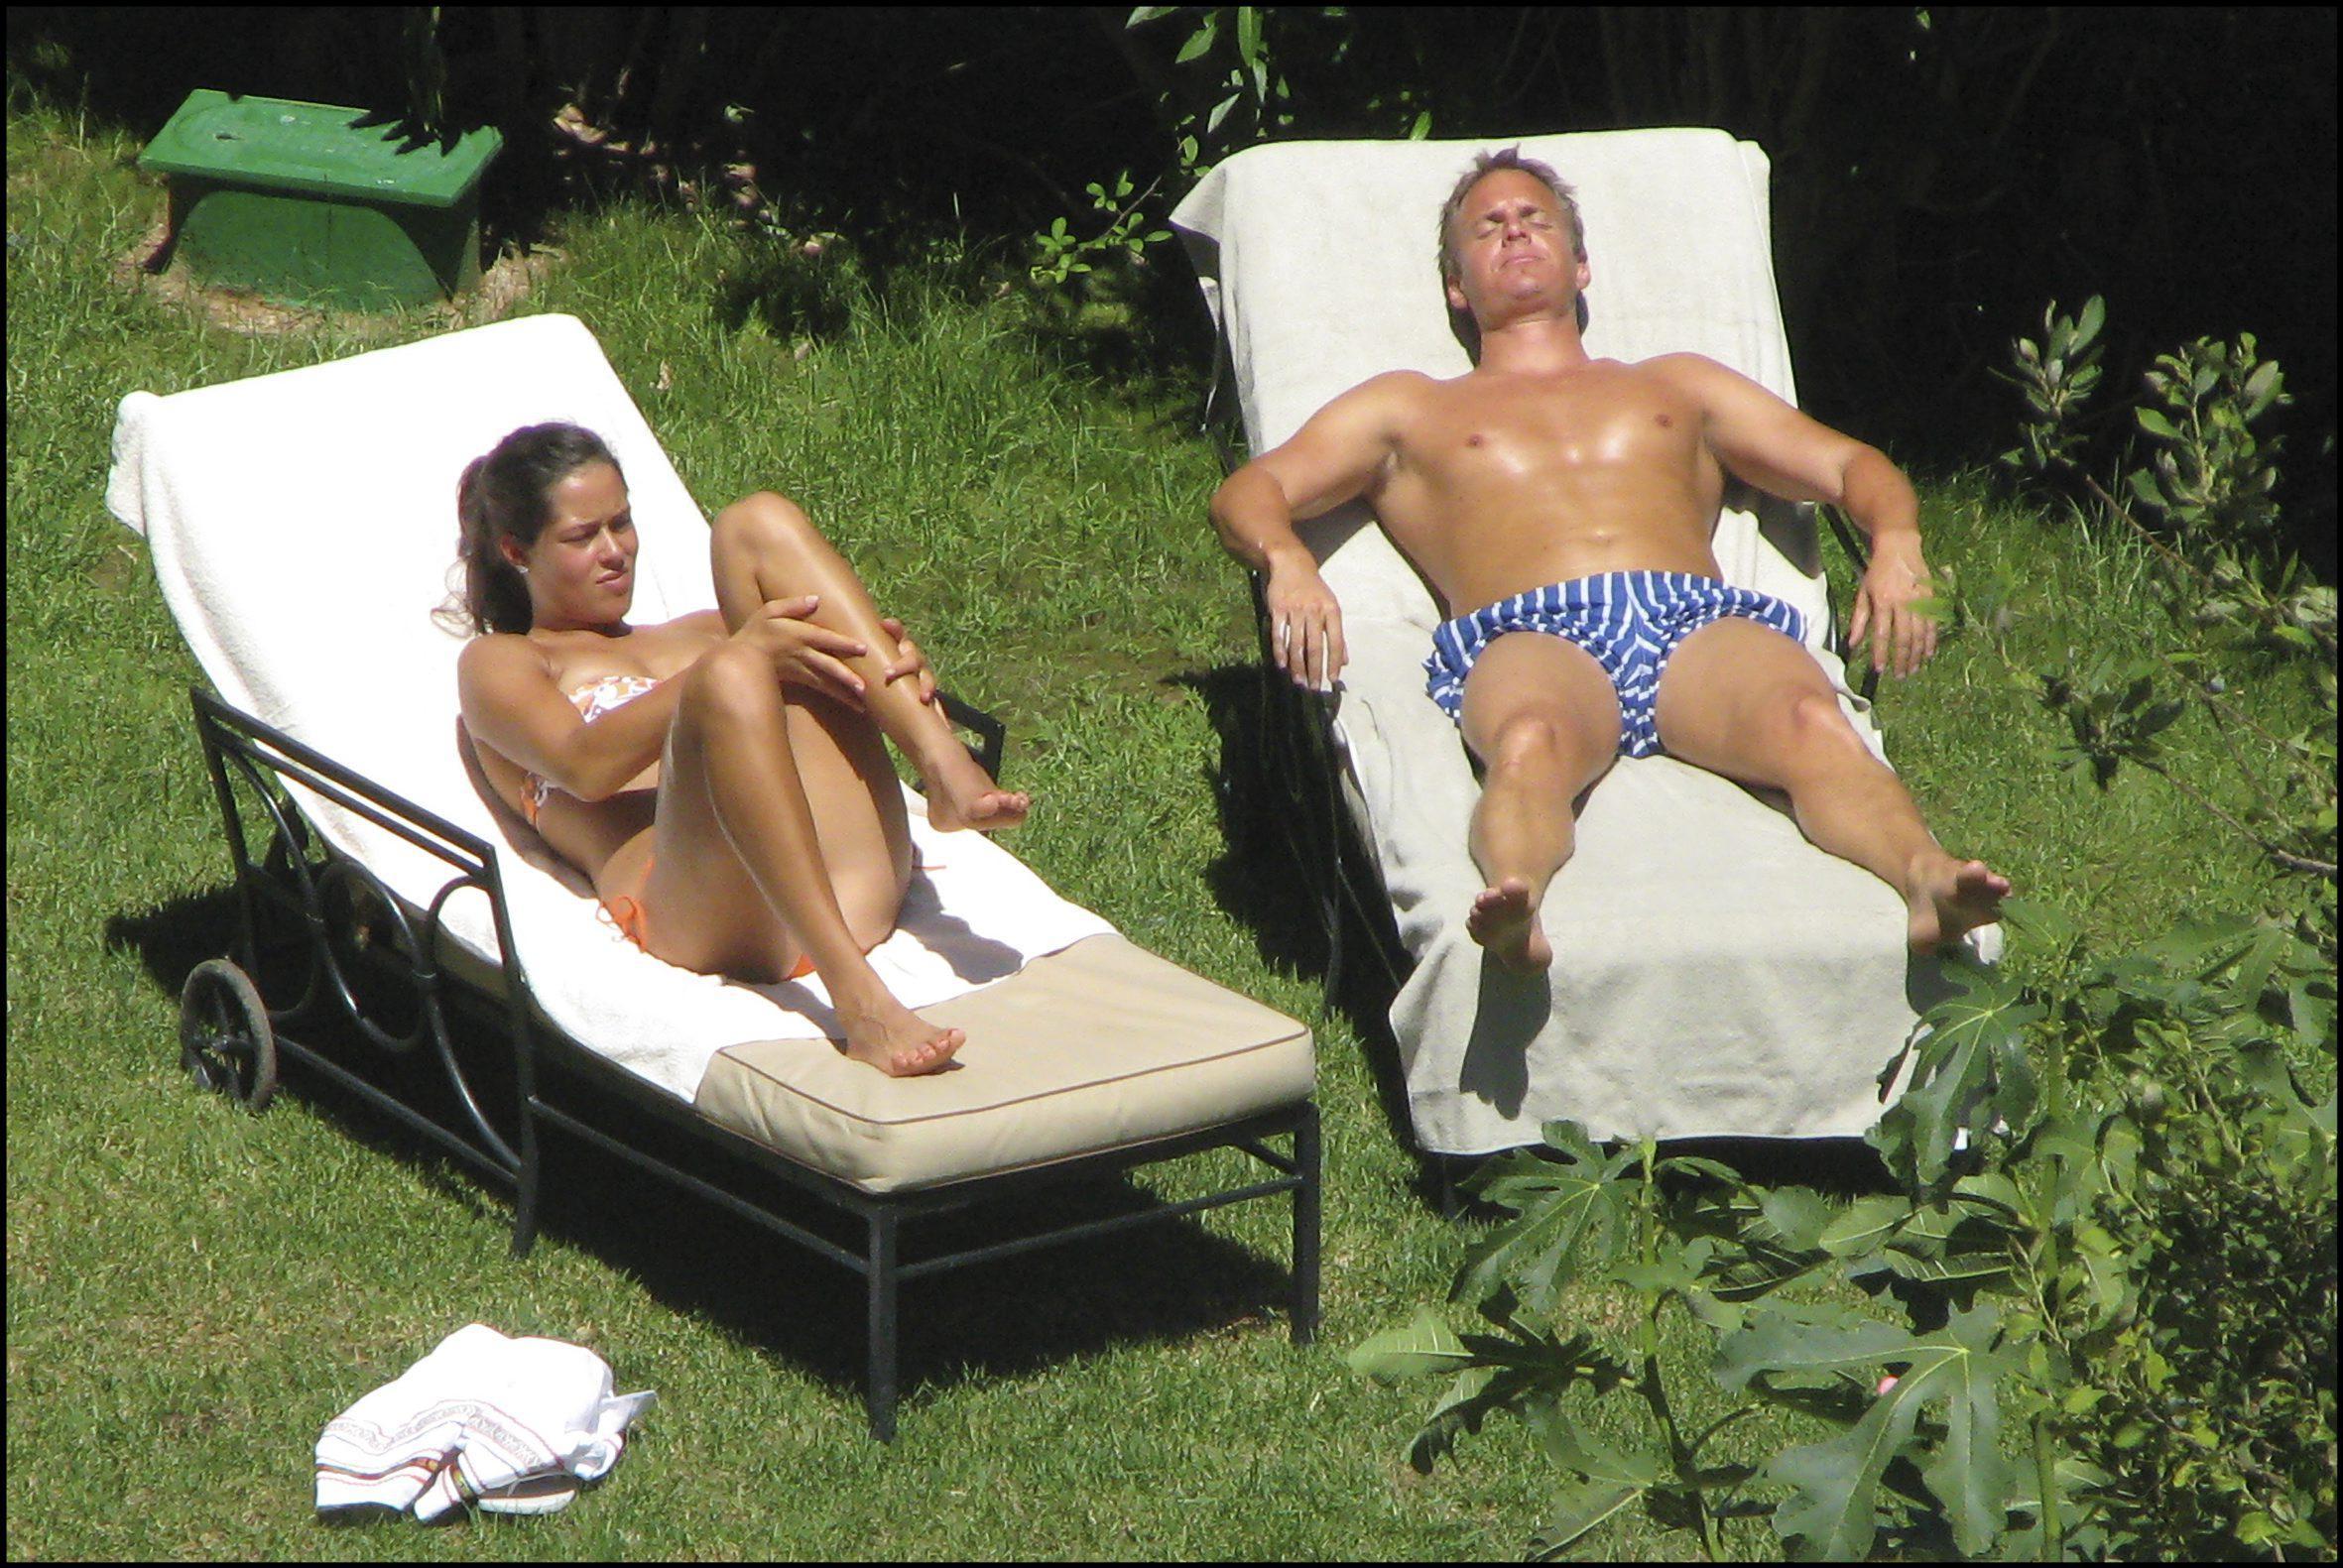 Free ivanovic naked pics, sexy naked midget bitch